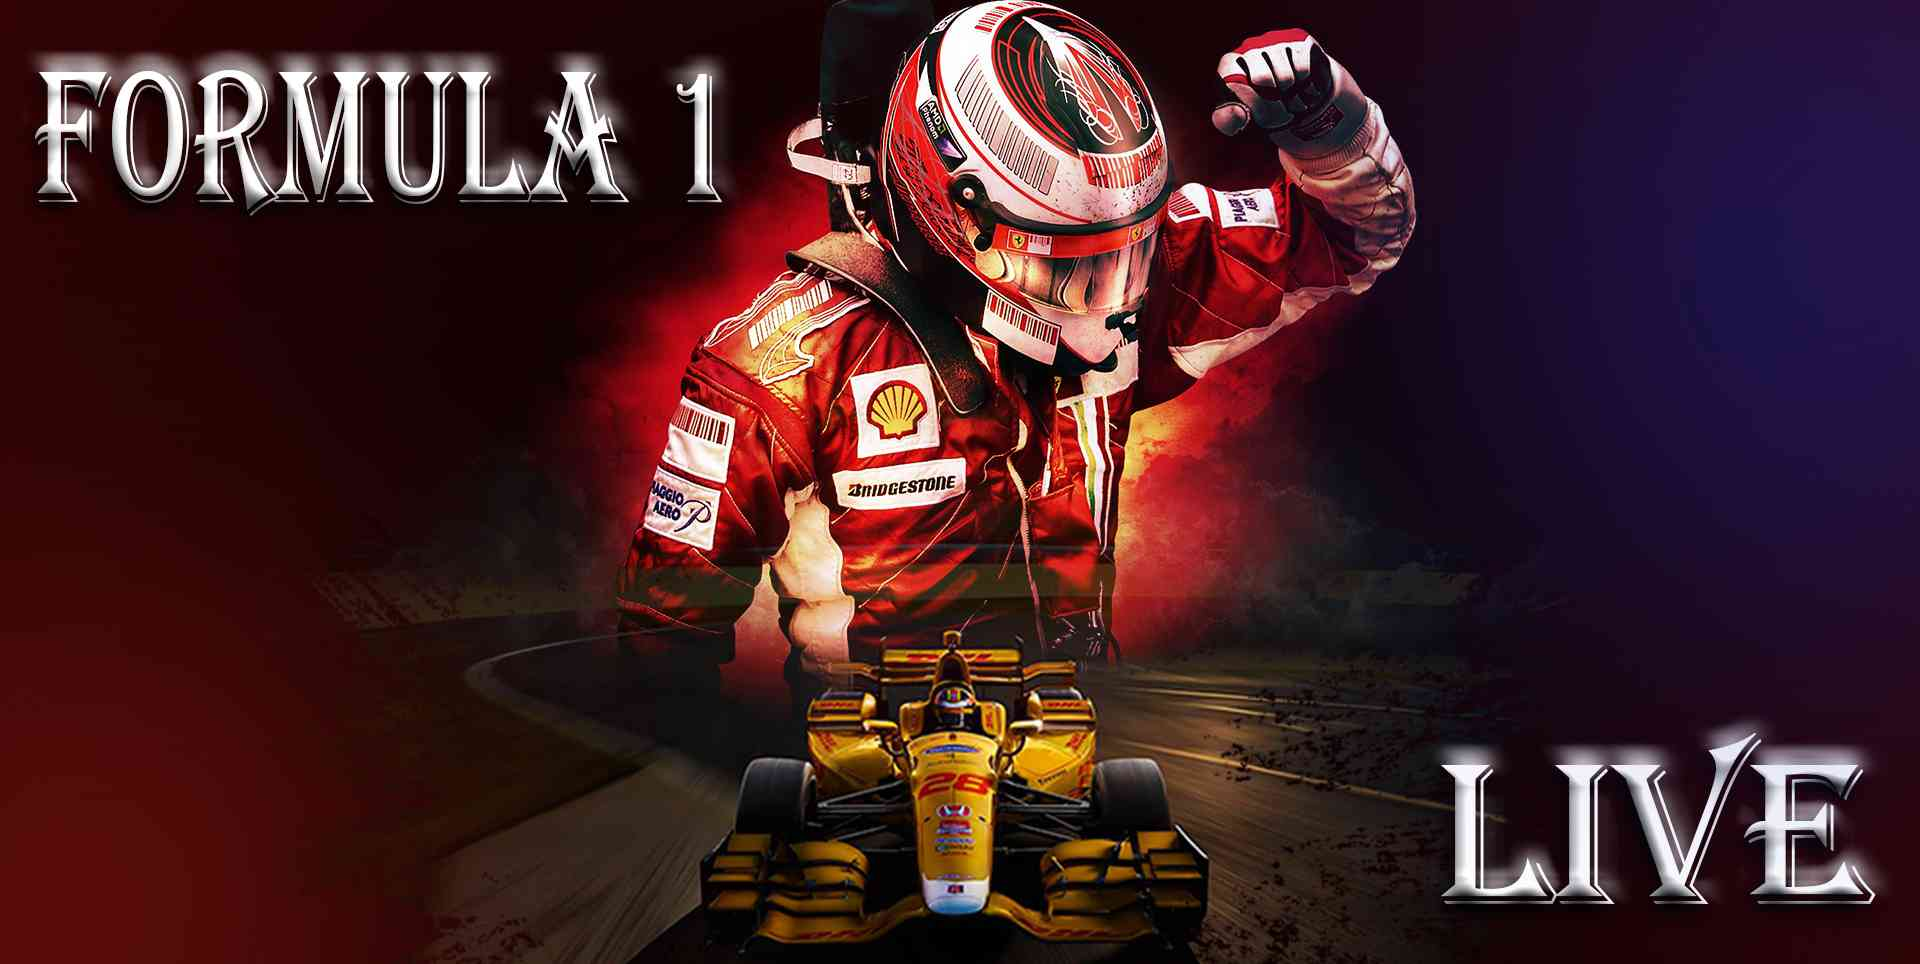 2016 London ePrix Race 2 Live Streaming